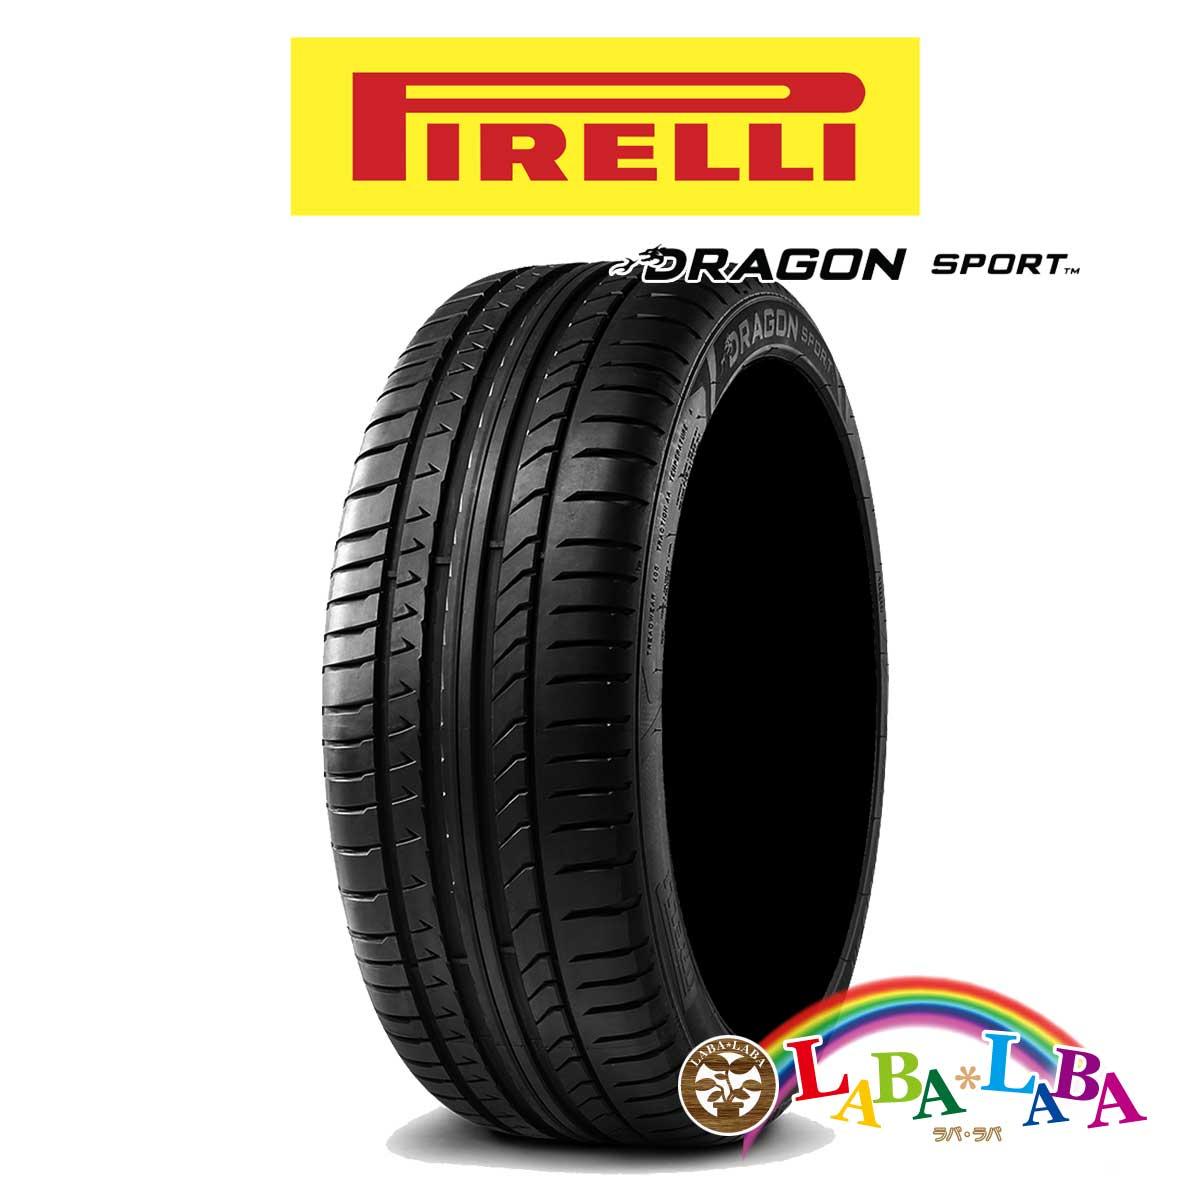 PIRELLI ピレリ ドラゴンスポーツ DRAGON SPORT 215/40R18 89Y XL サマータイヤ 2本セット